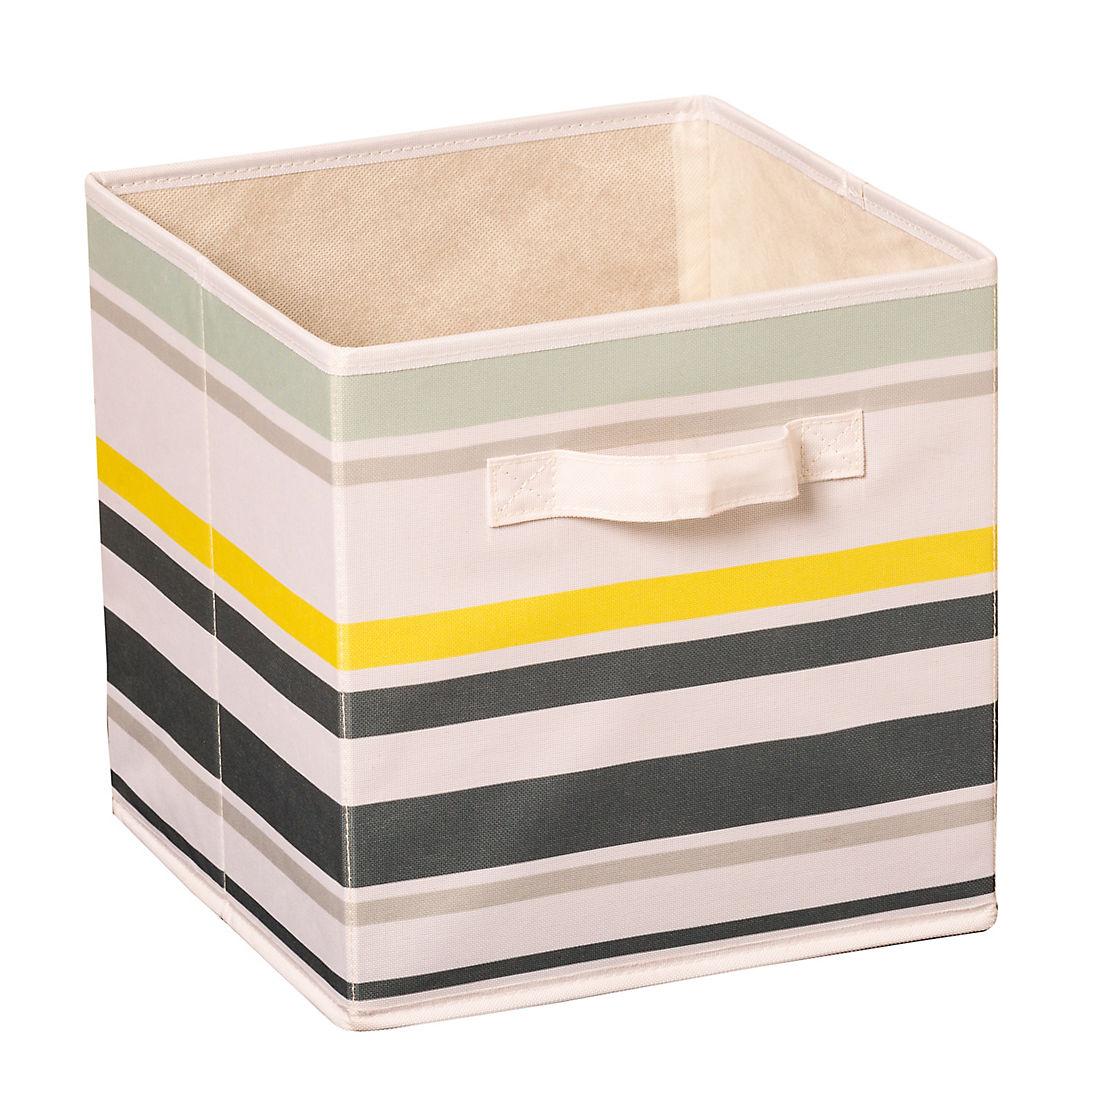 Honey-Can-Do 3-Pc. Explore + Store Kids Toy Storage Bin Set - Multi-Stripe